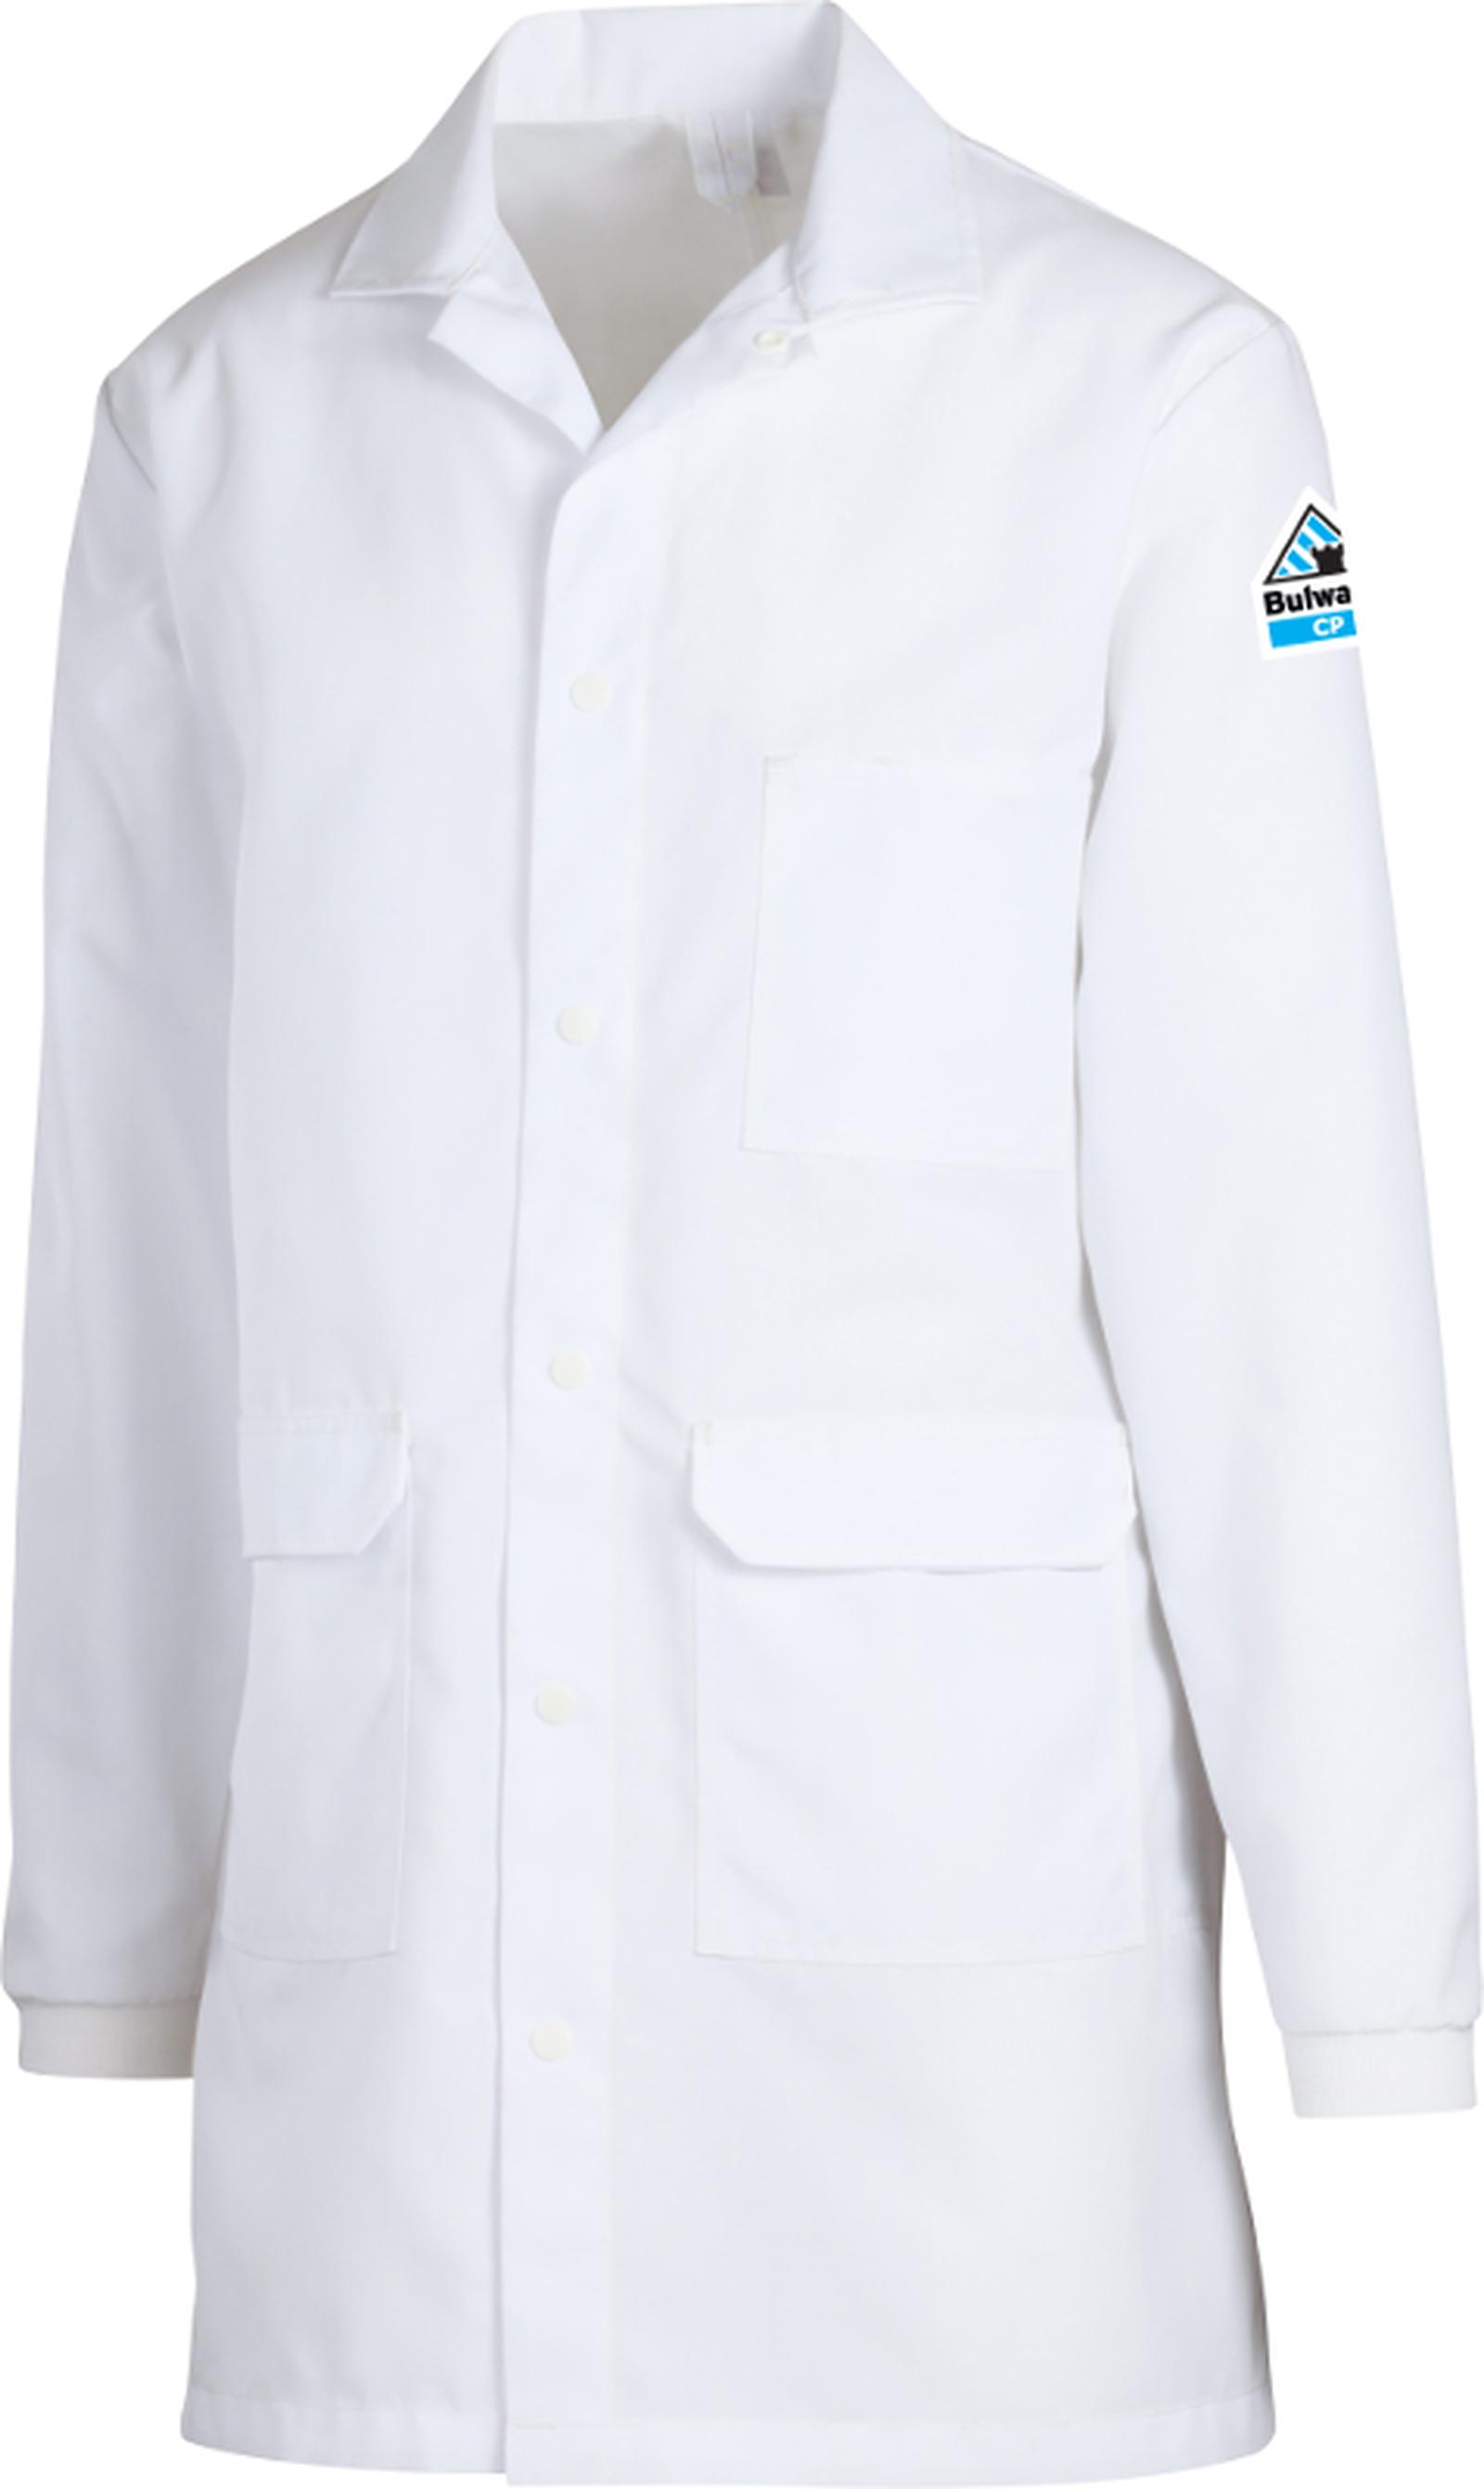 Lightweight CP Lab Coat